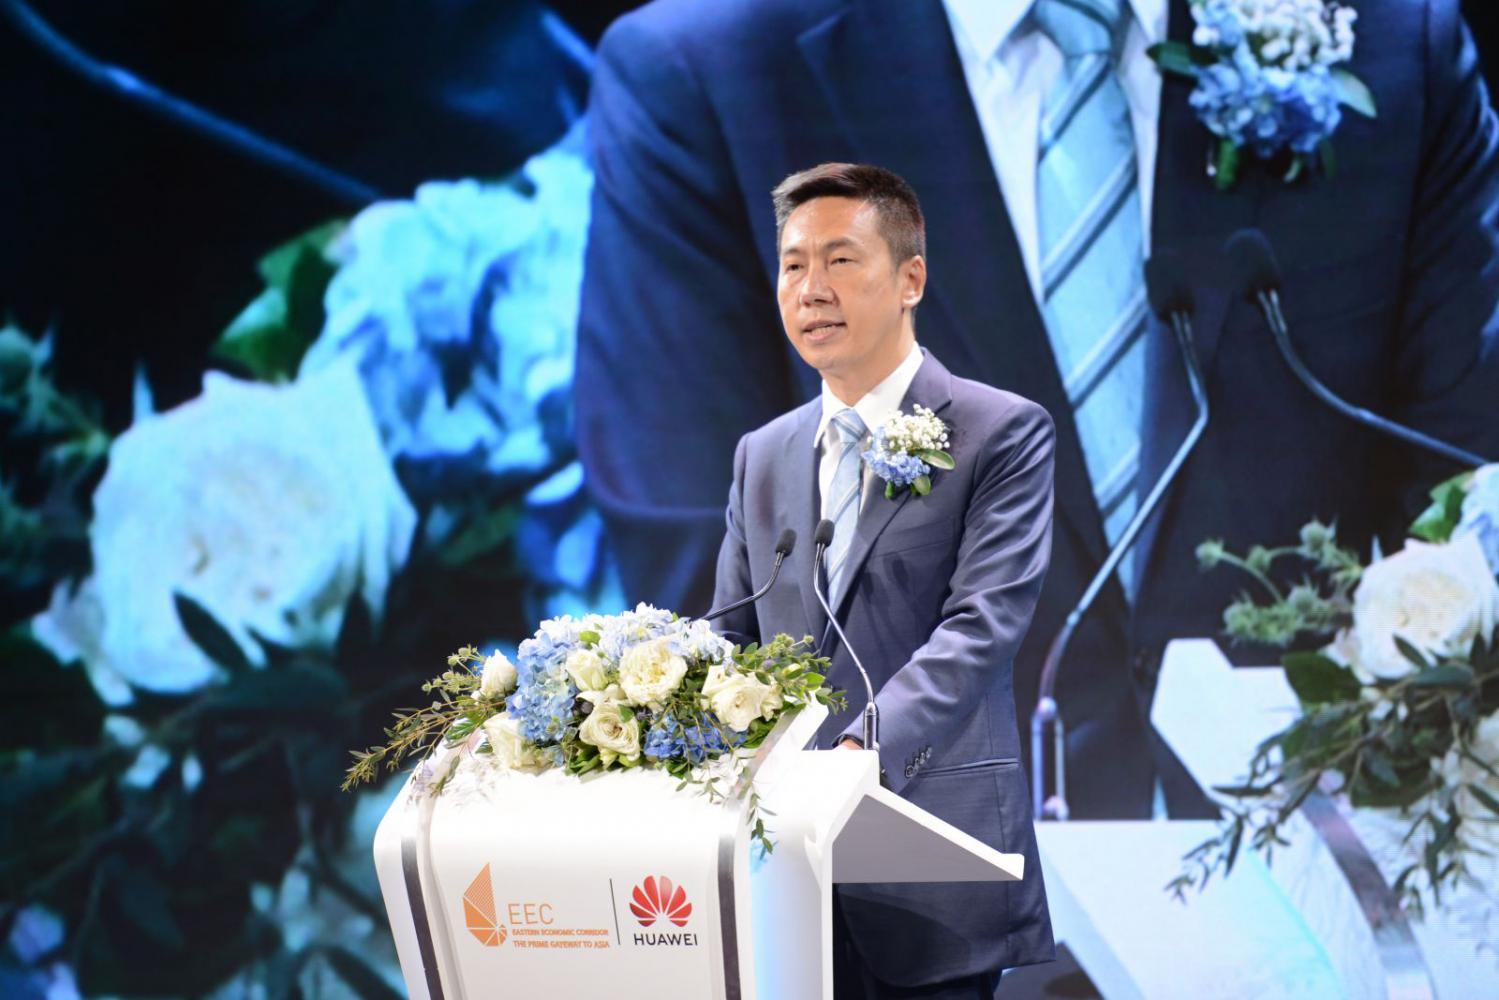 Yang Xin: New vaccines on way